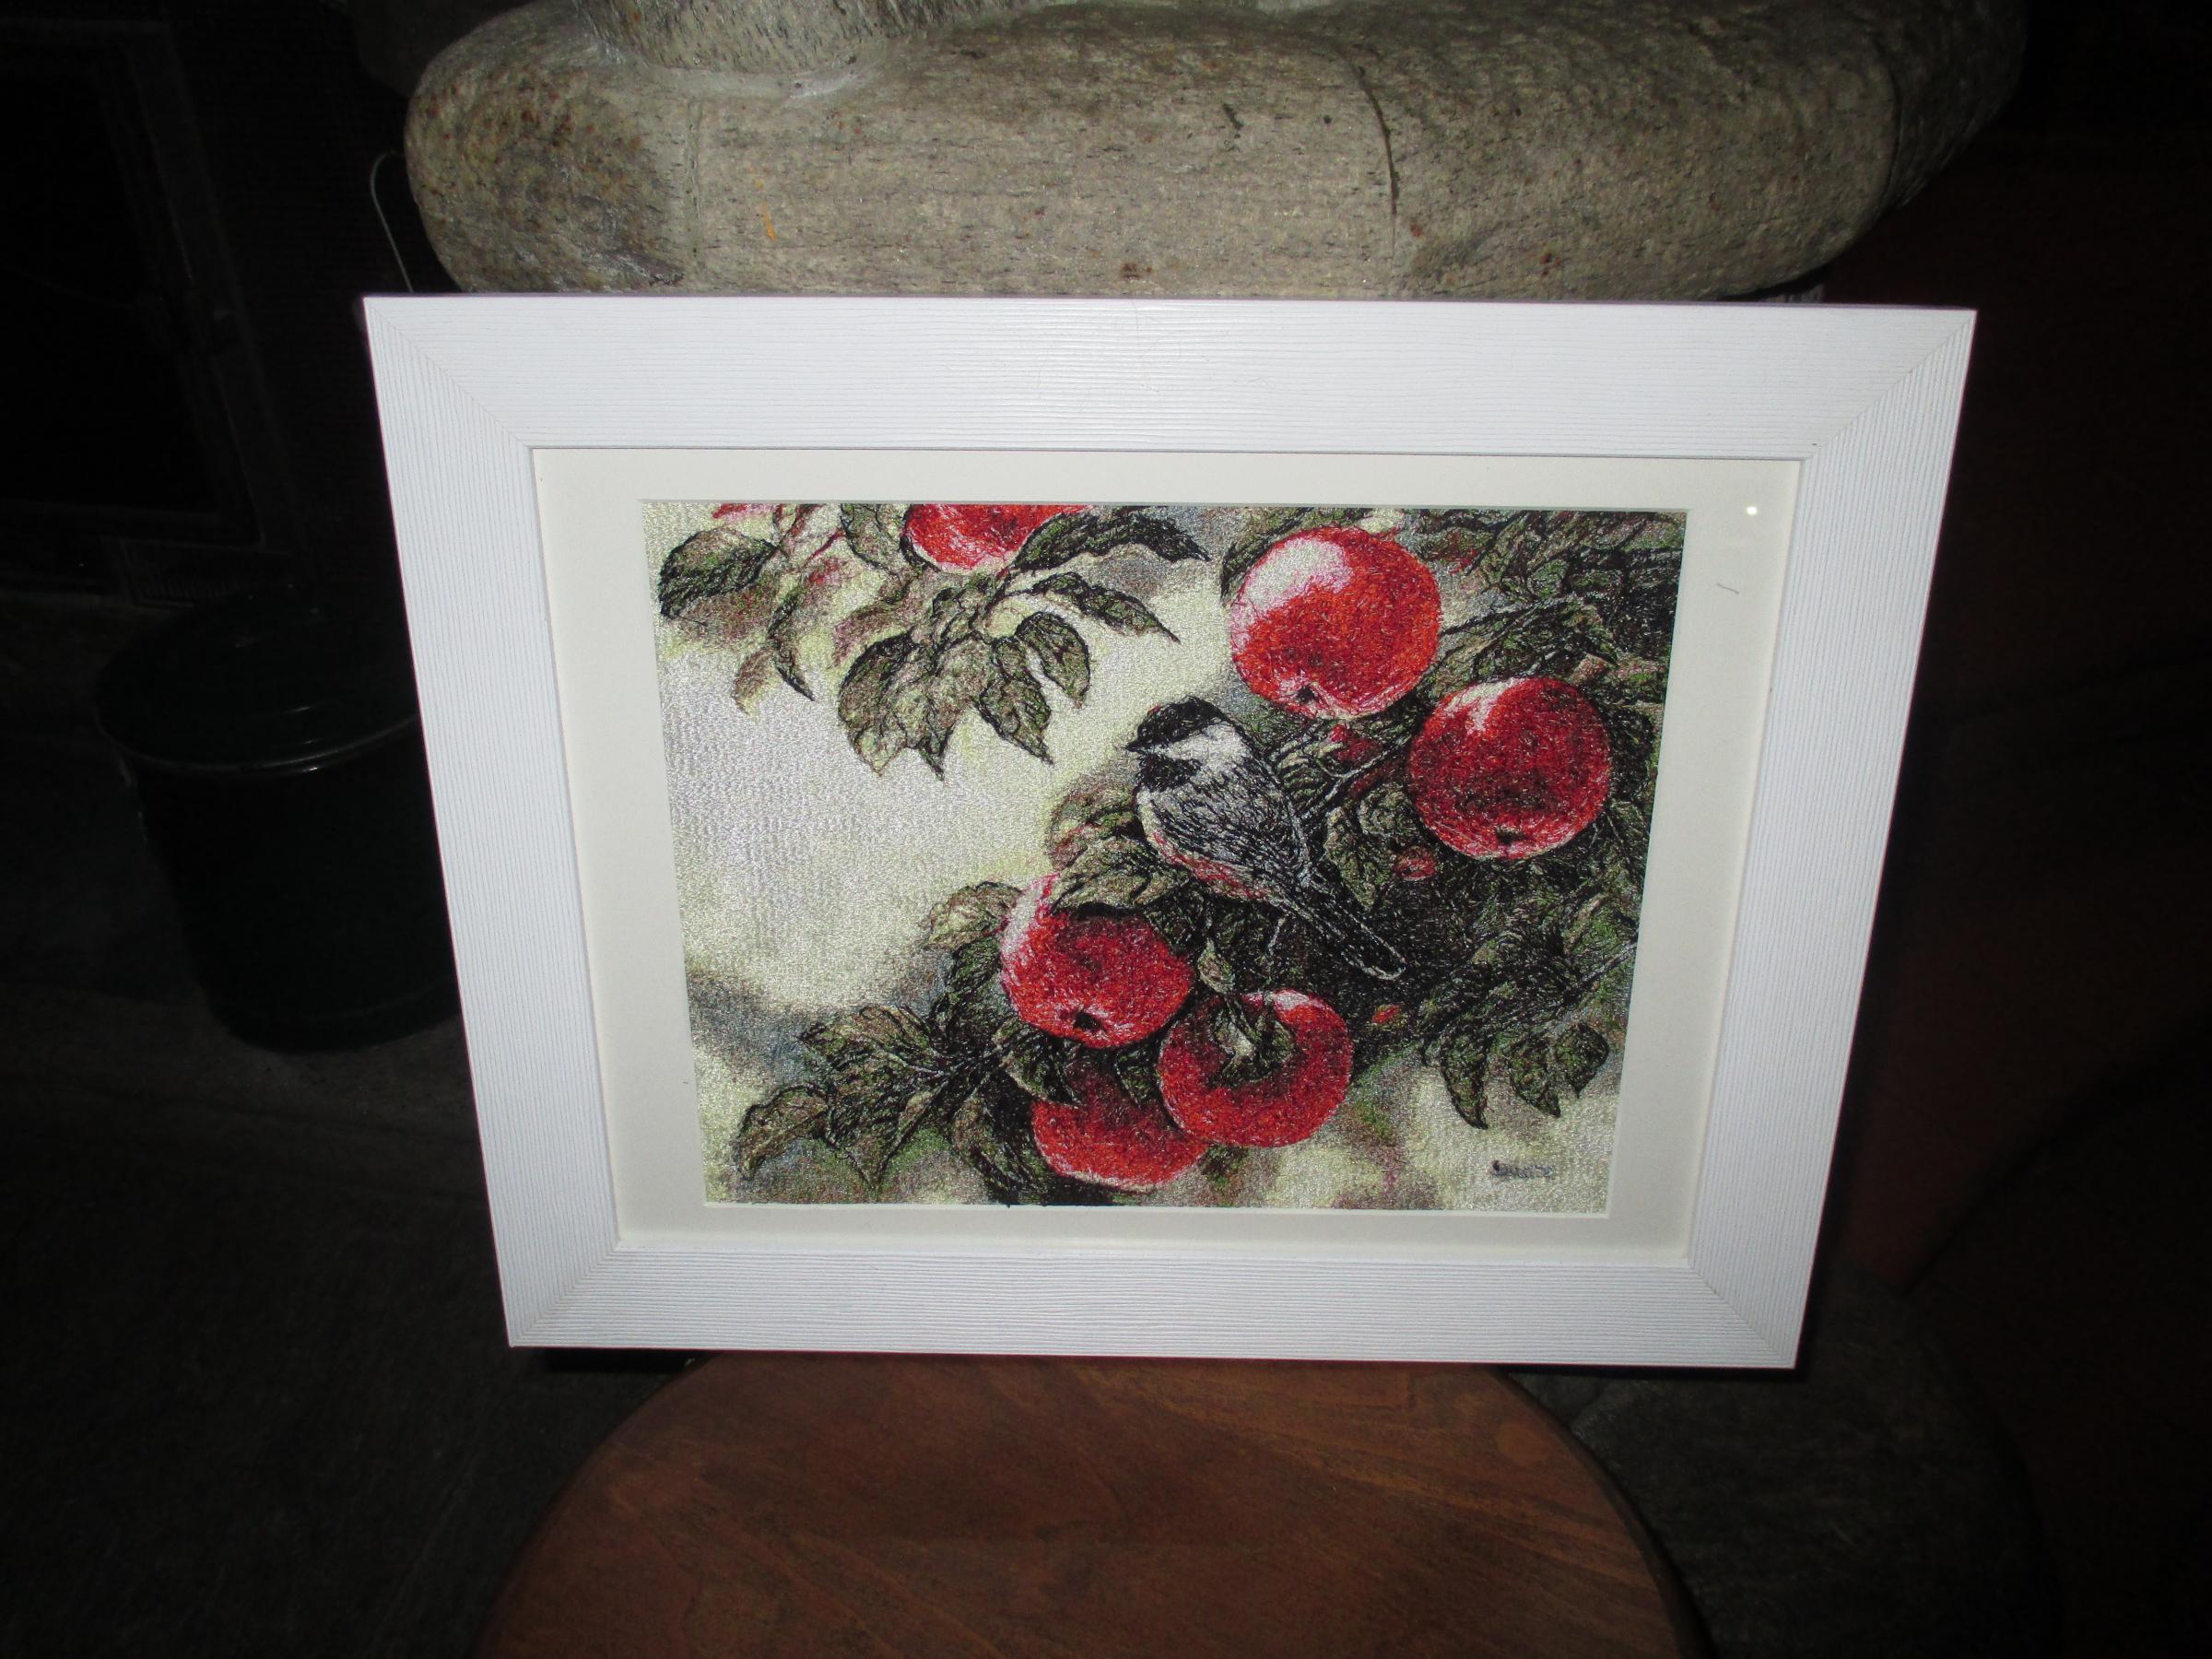 Apples photo stitch embroidery design